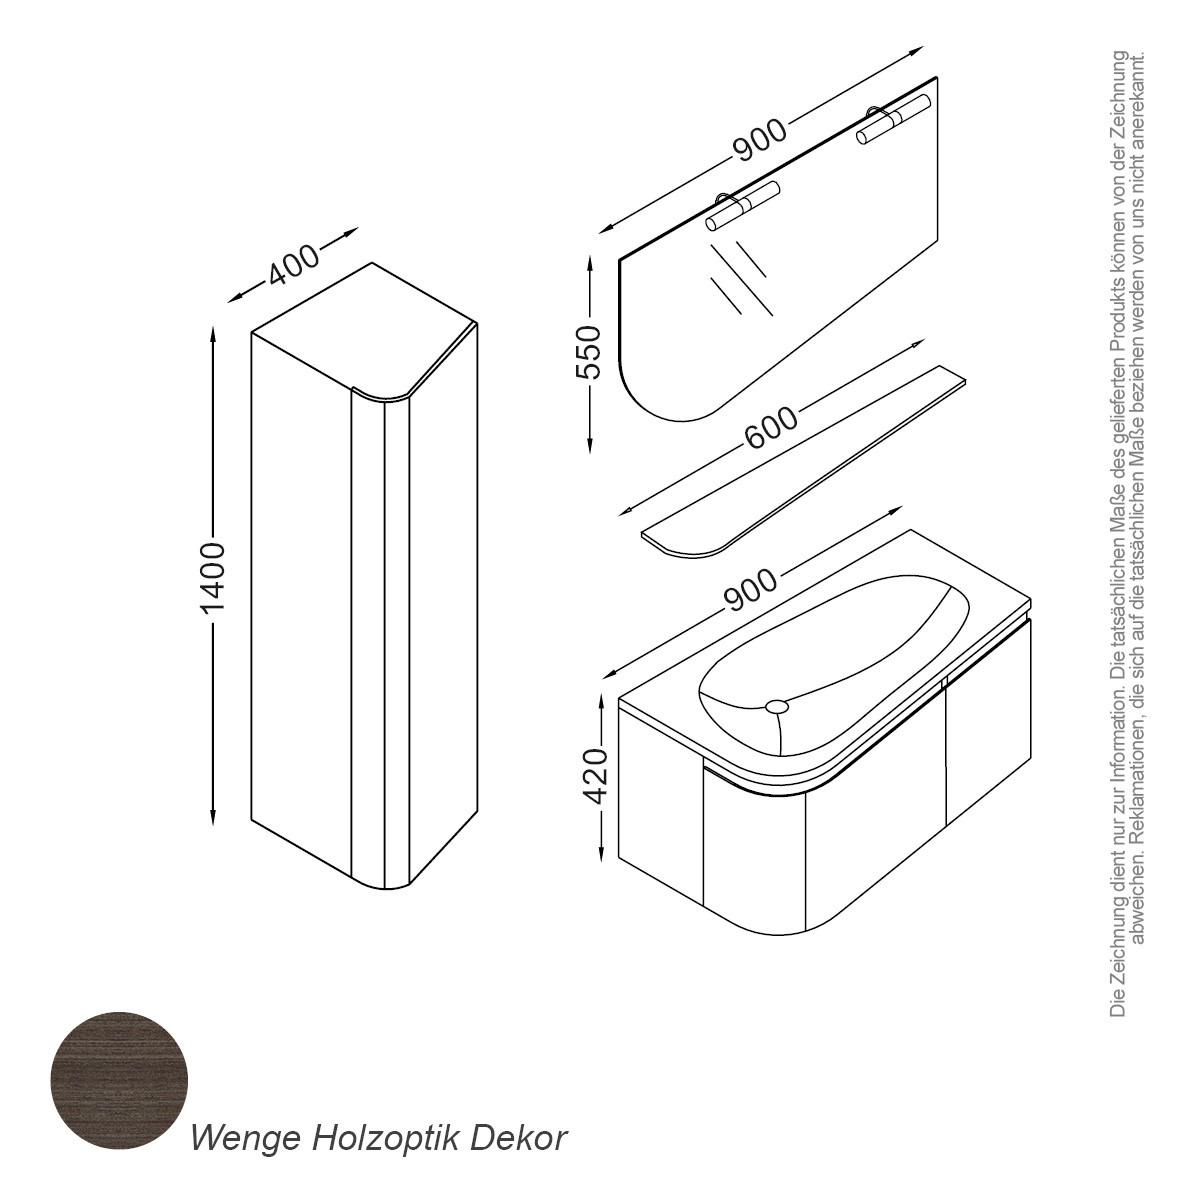 monaco set 90 cm braun badewelt badezimmer möbel serien sets, Badezimmer ideen